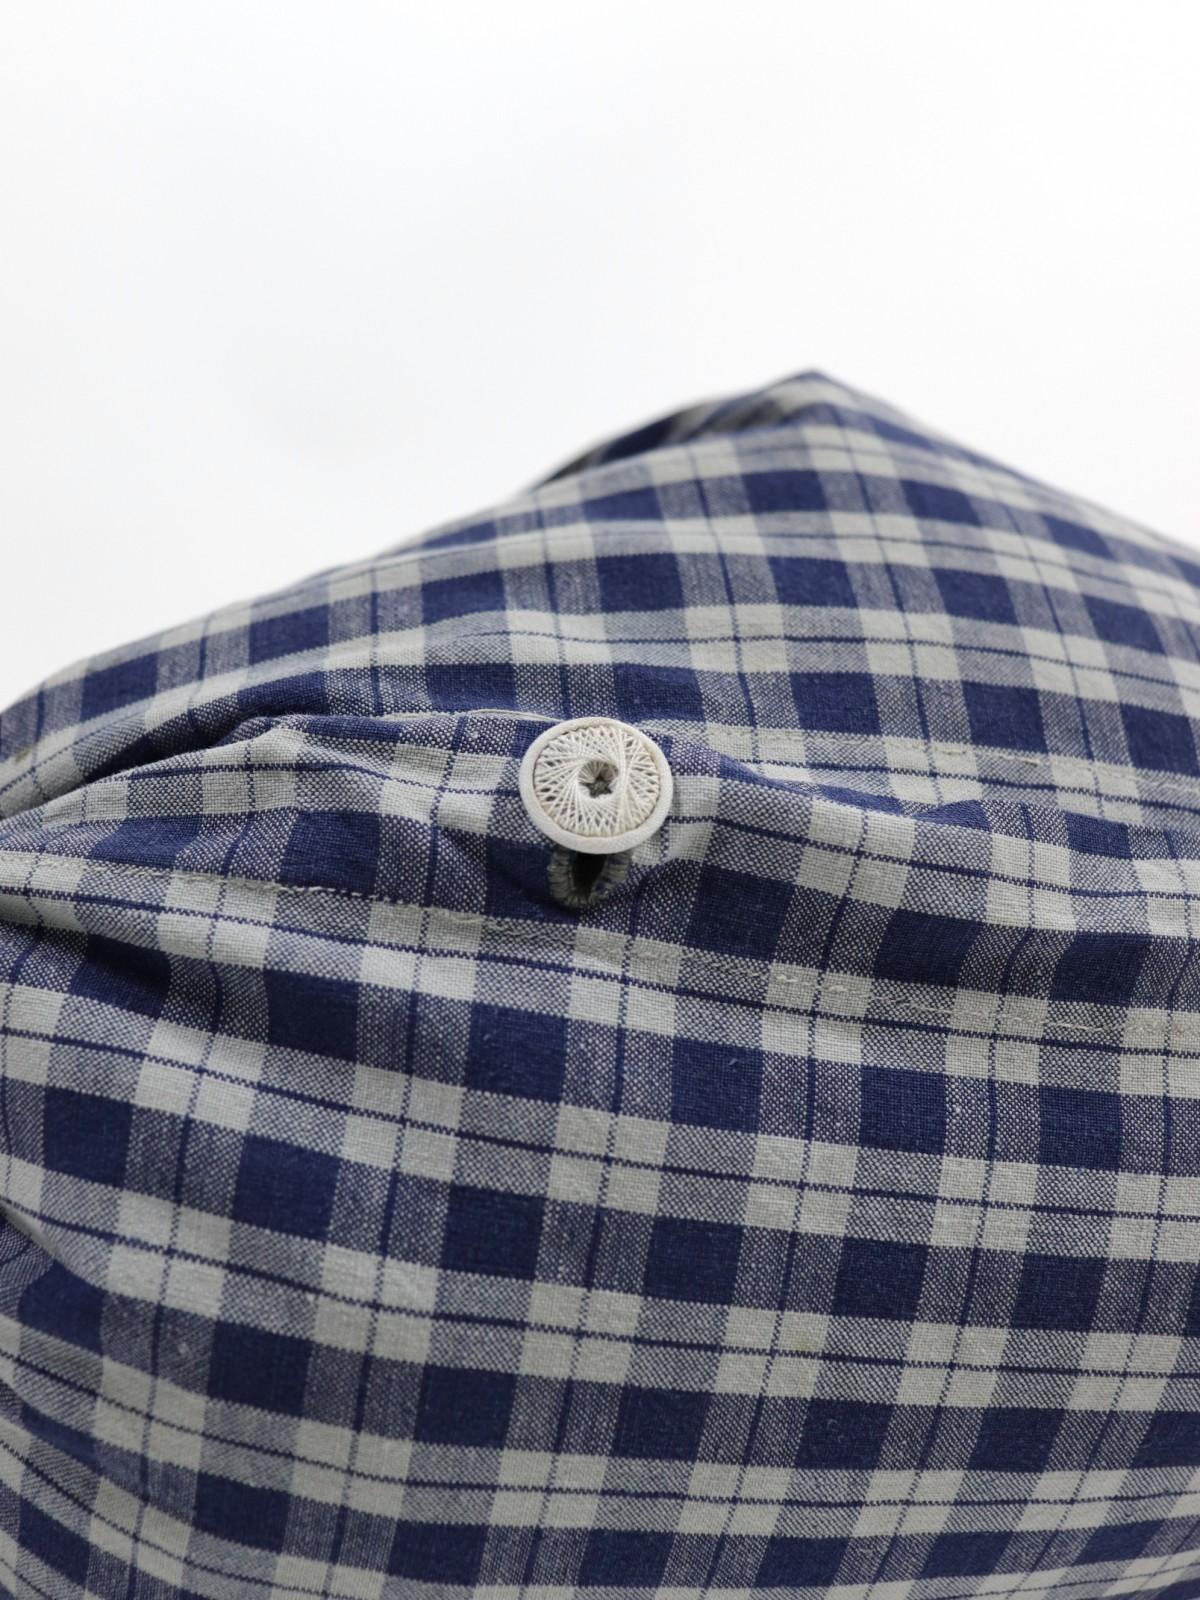 German cotton check fabric , Brown.remake, Cushion